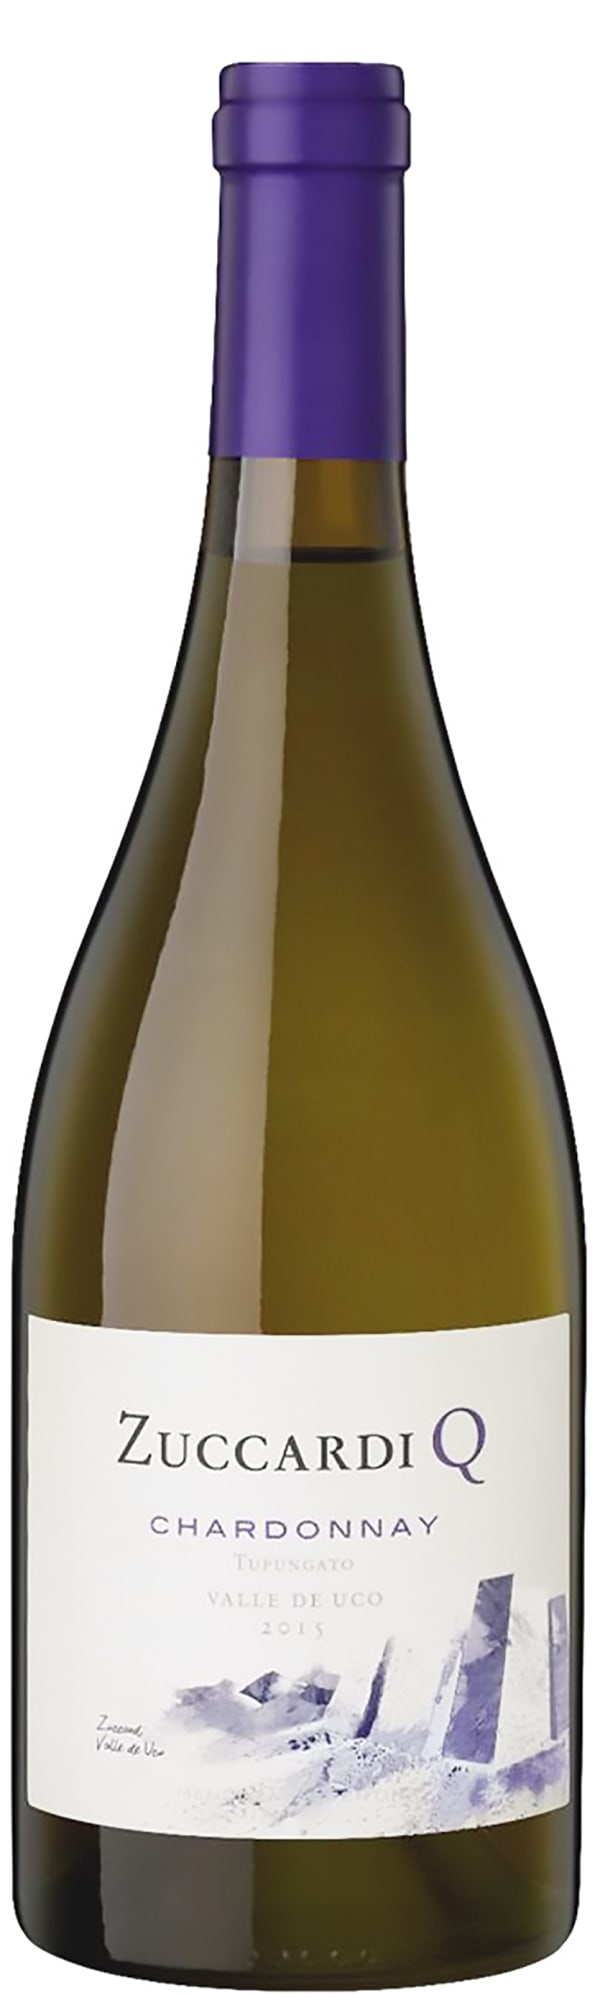 Zuccardi Q Chardonnay 2015